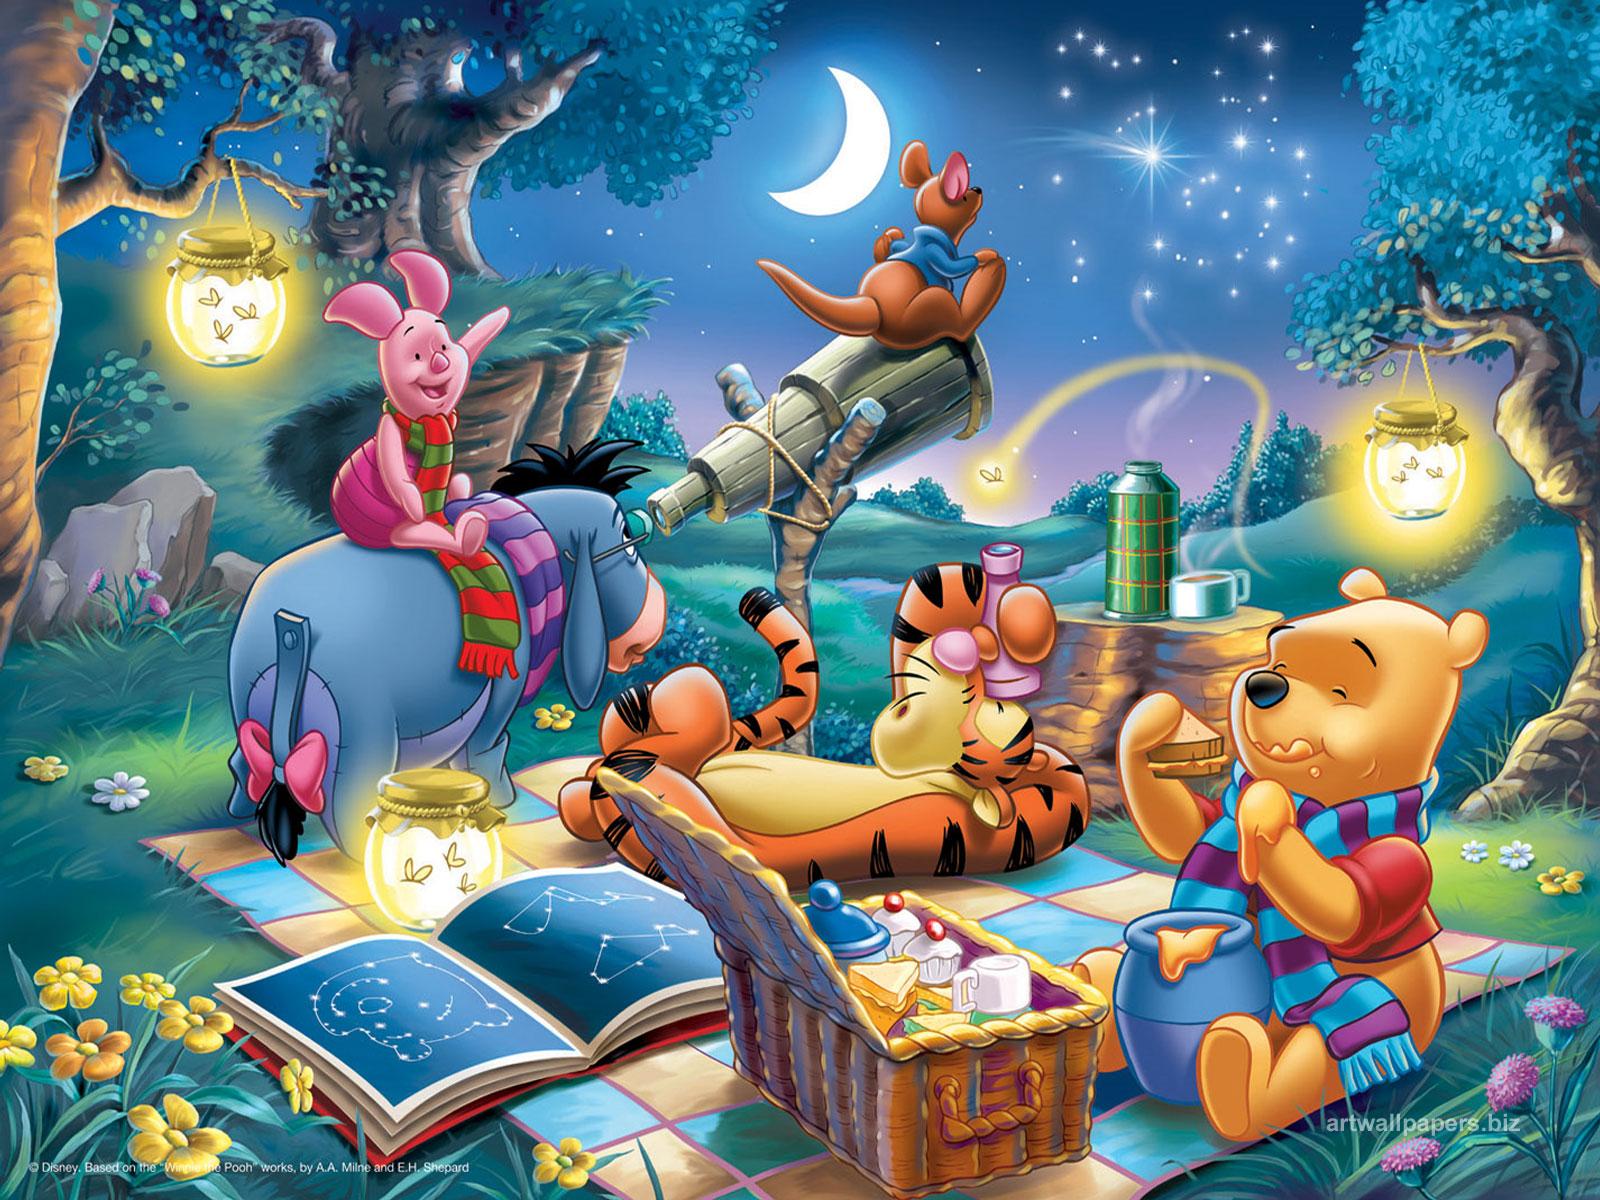 winnie the pooh on Pinterest | Winnie The Pooh, Pooh Bear and Piglets